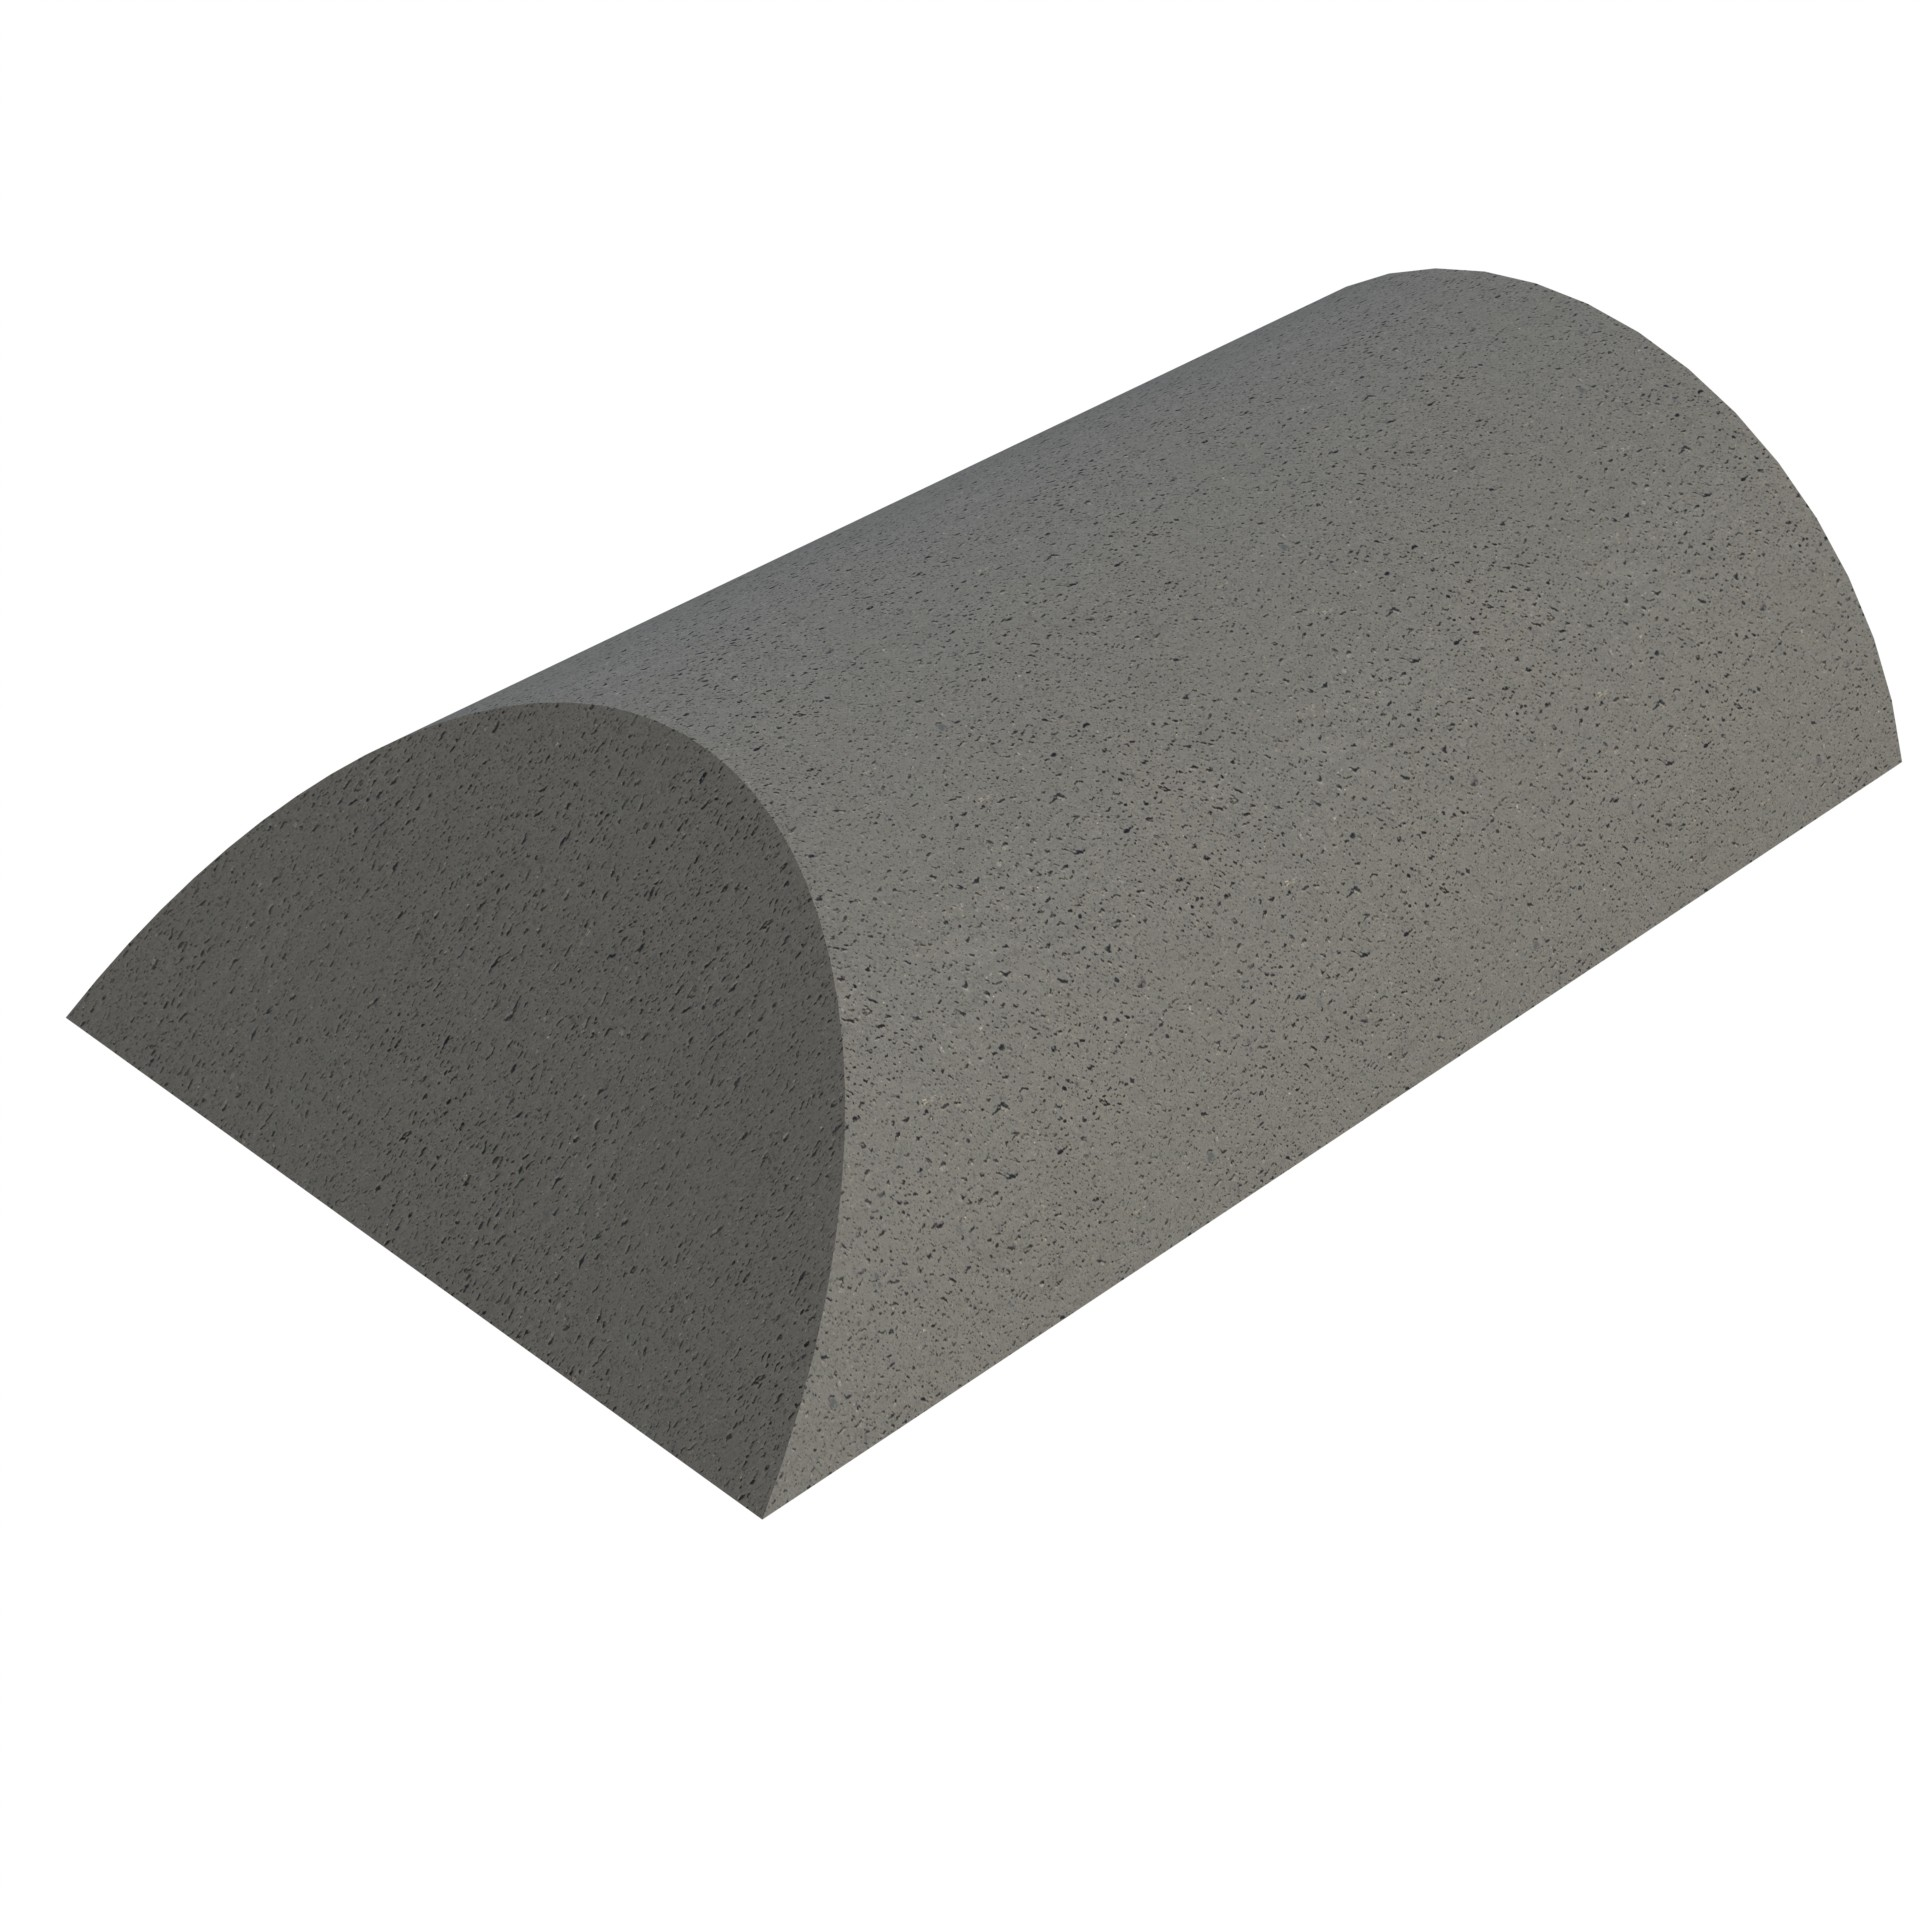 SANDTOFT TILES - Concrete Half Round Ridge With Hip End